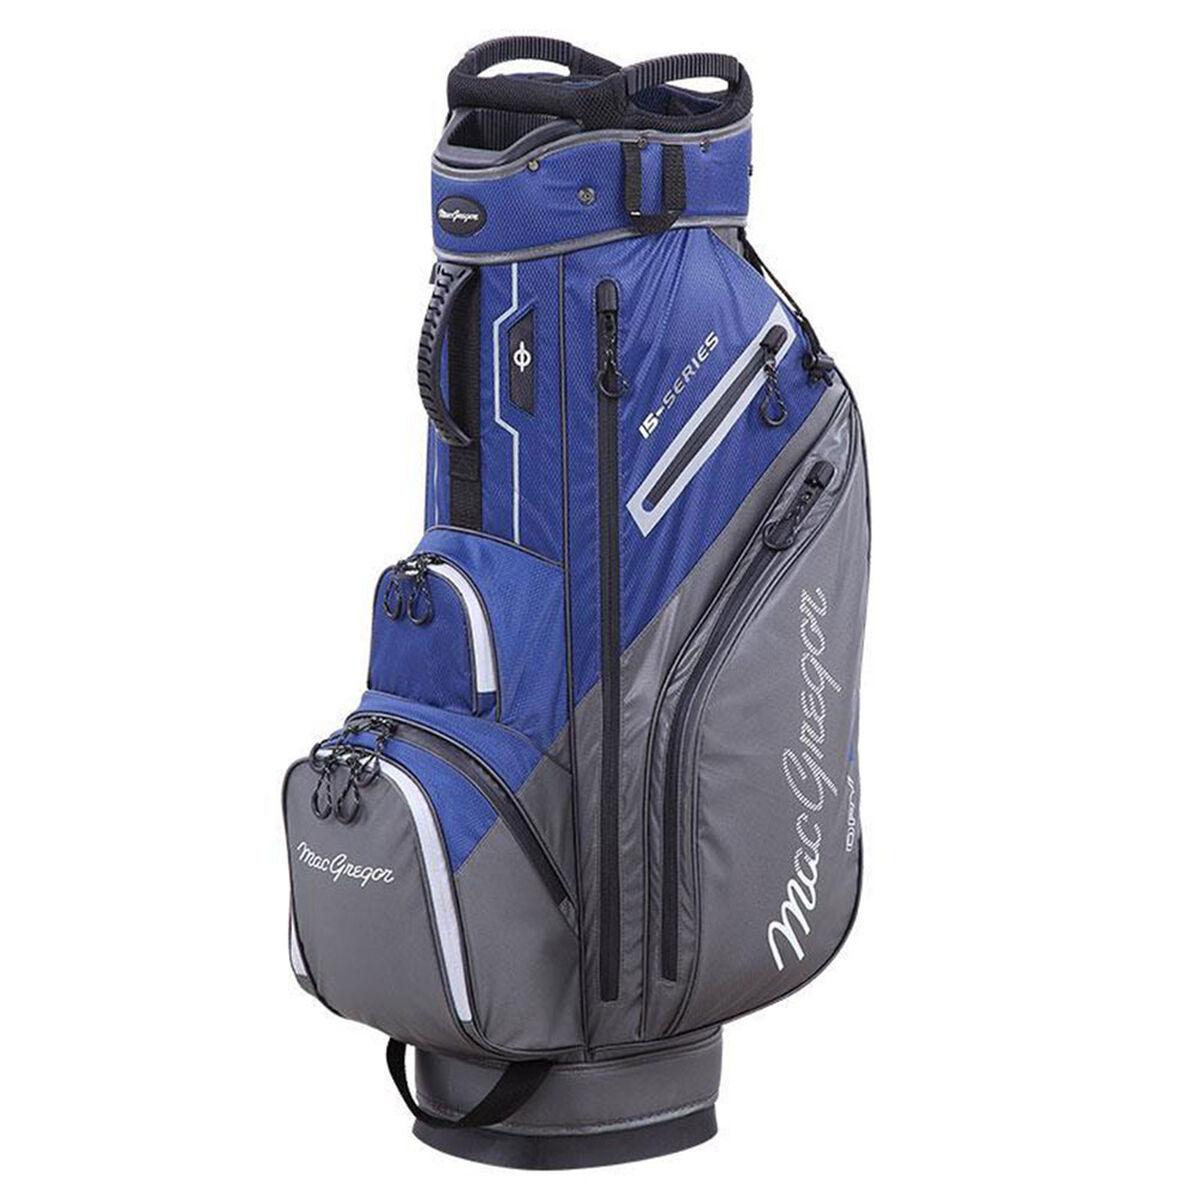 MacGregor 15-Series Water-Resistant Golf Cart Bag, Navy/grey, One Size   American Golf